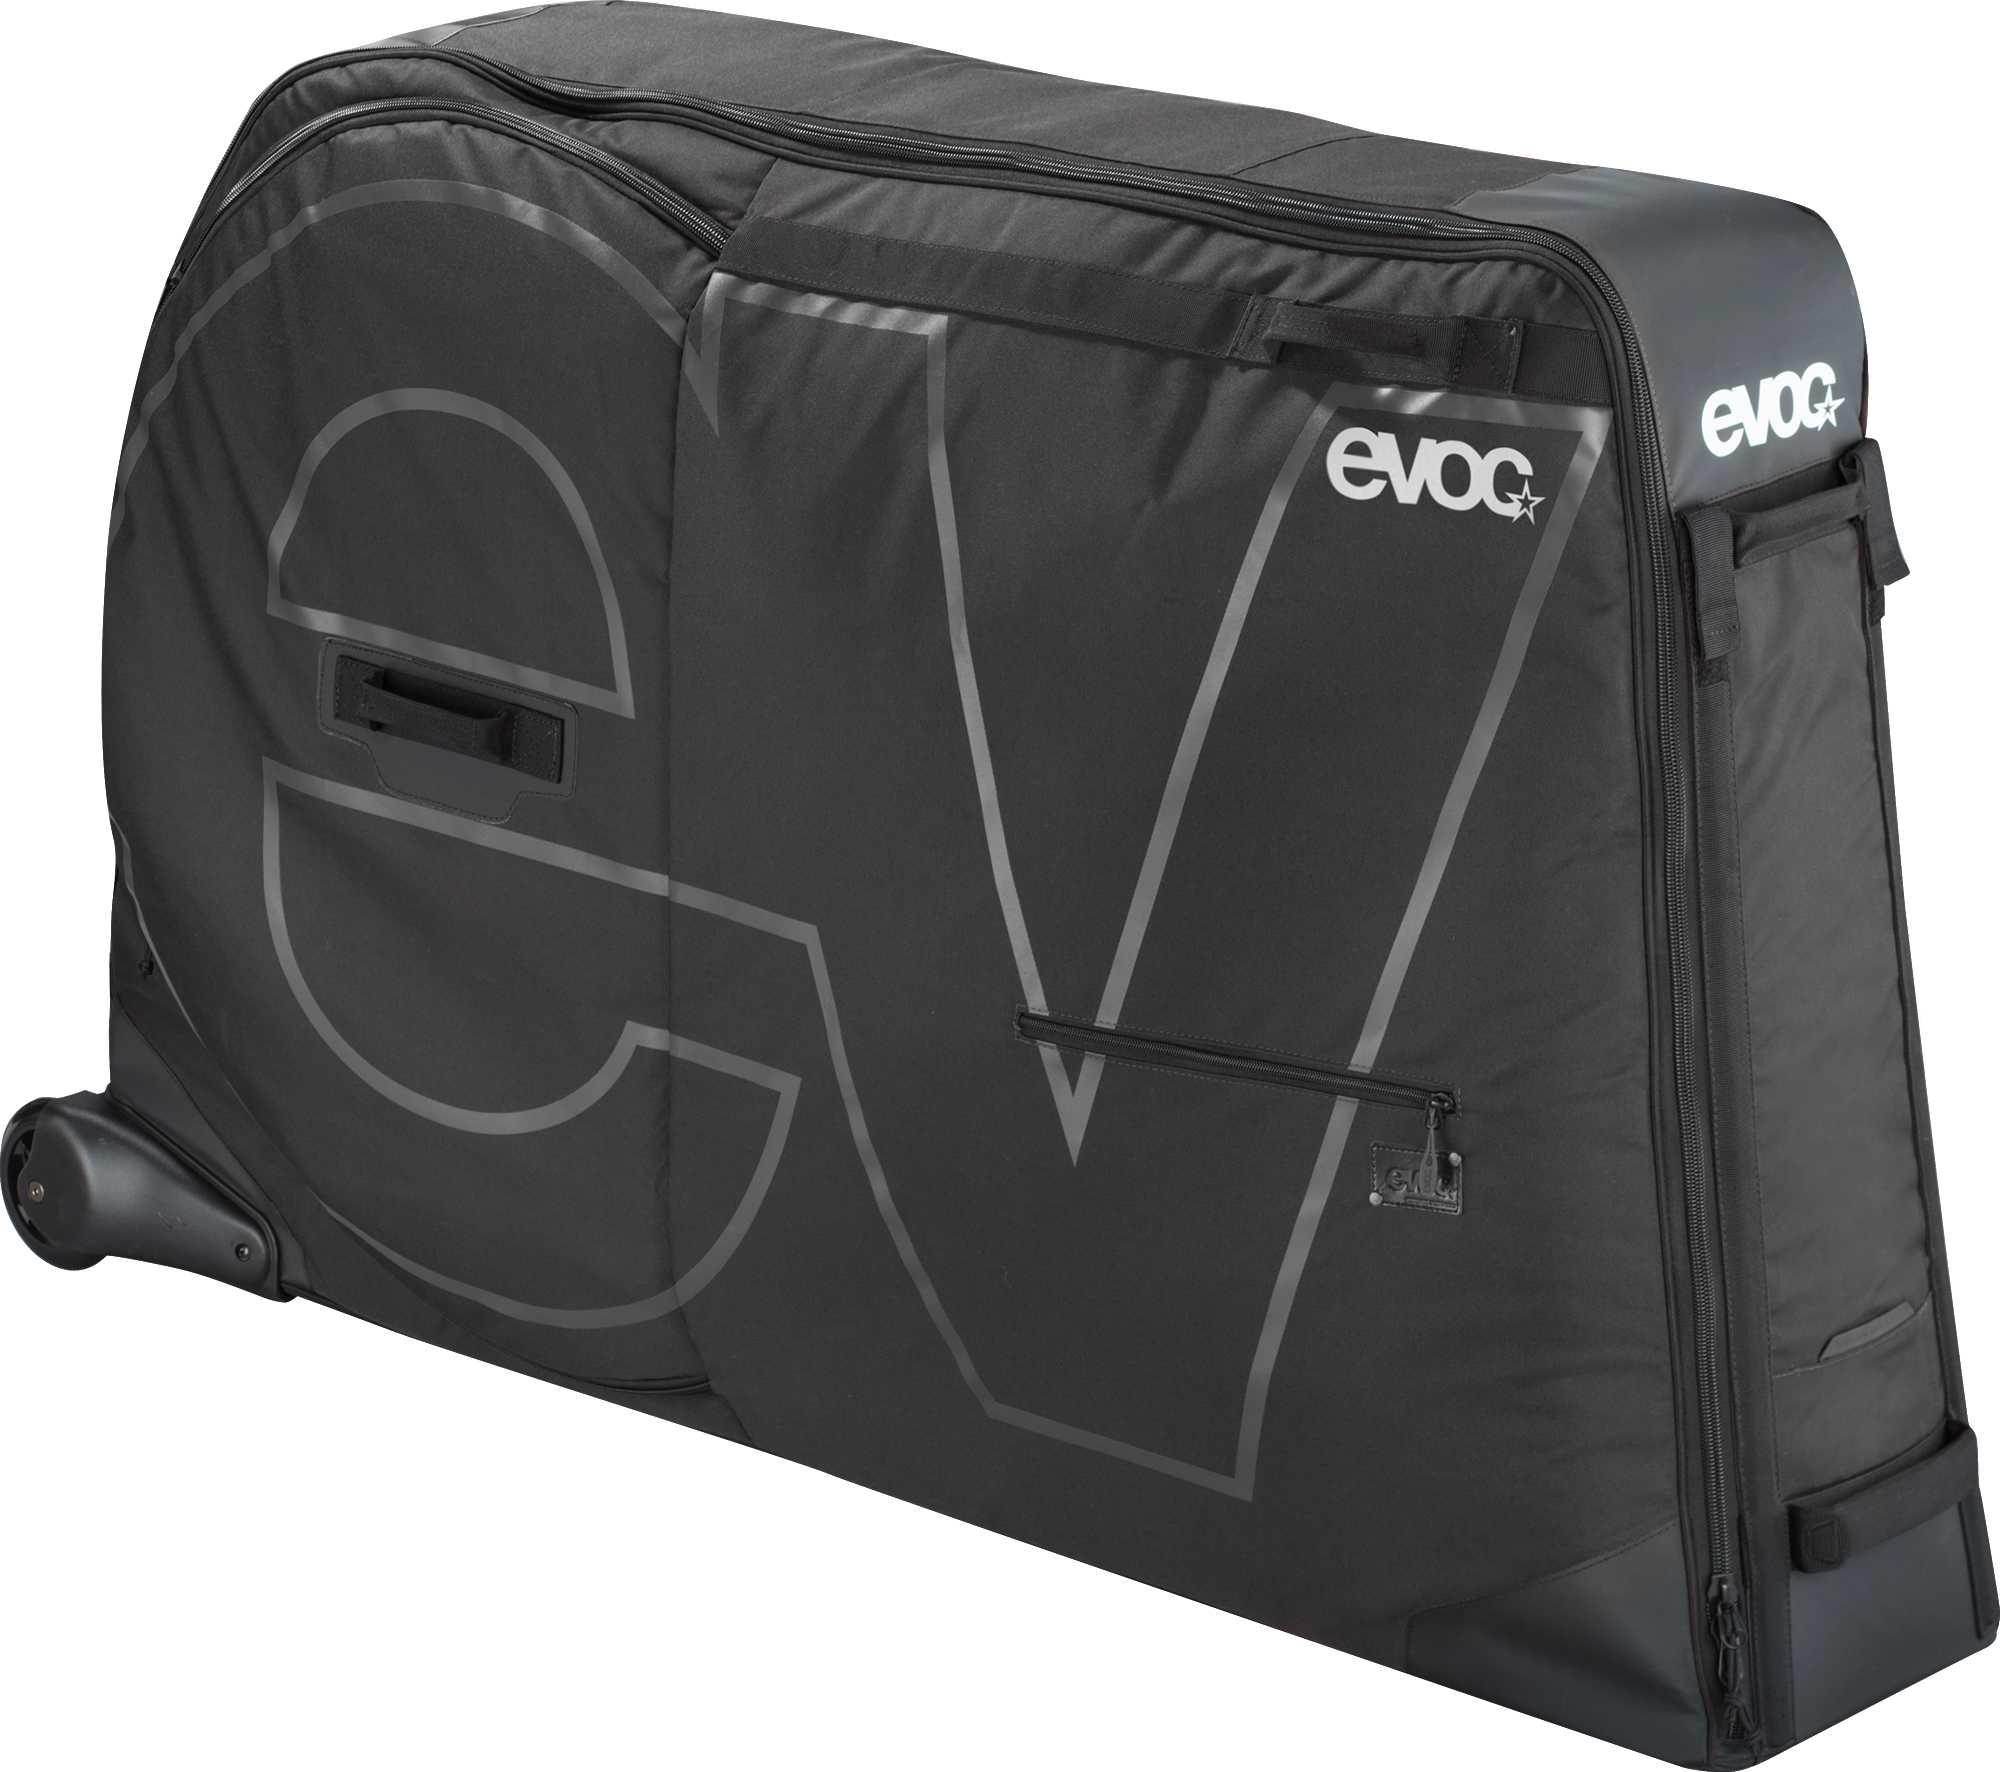 Cykel transporttaske Evoc Bike Travel Bag 280 l sort | Cykelkuffert